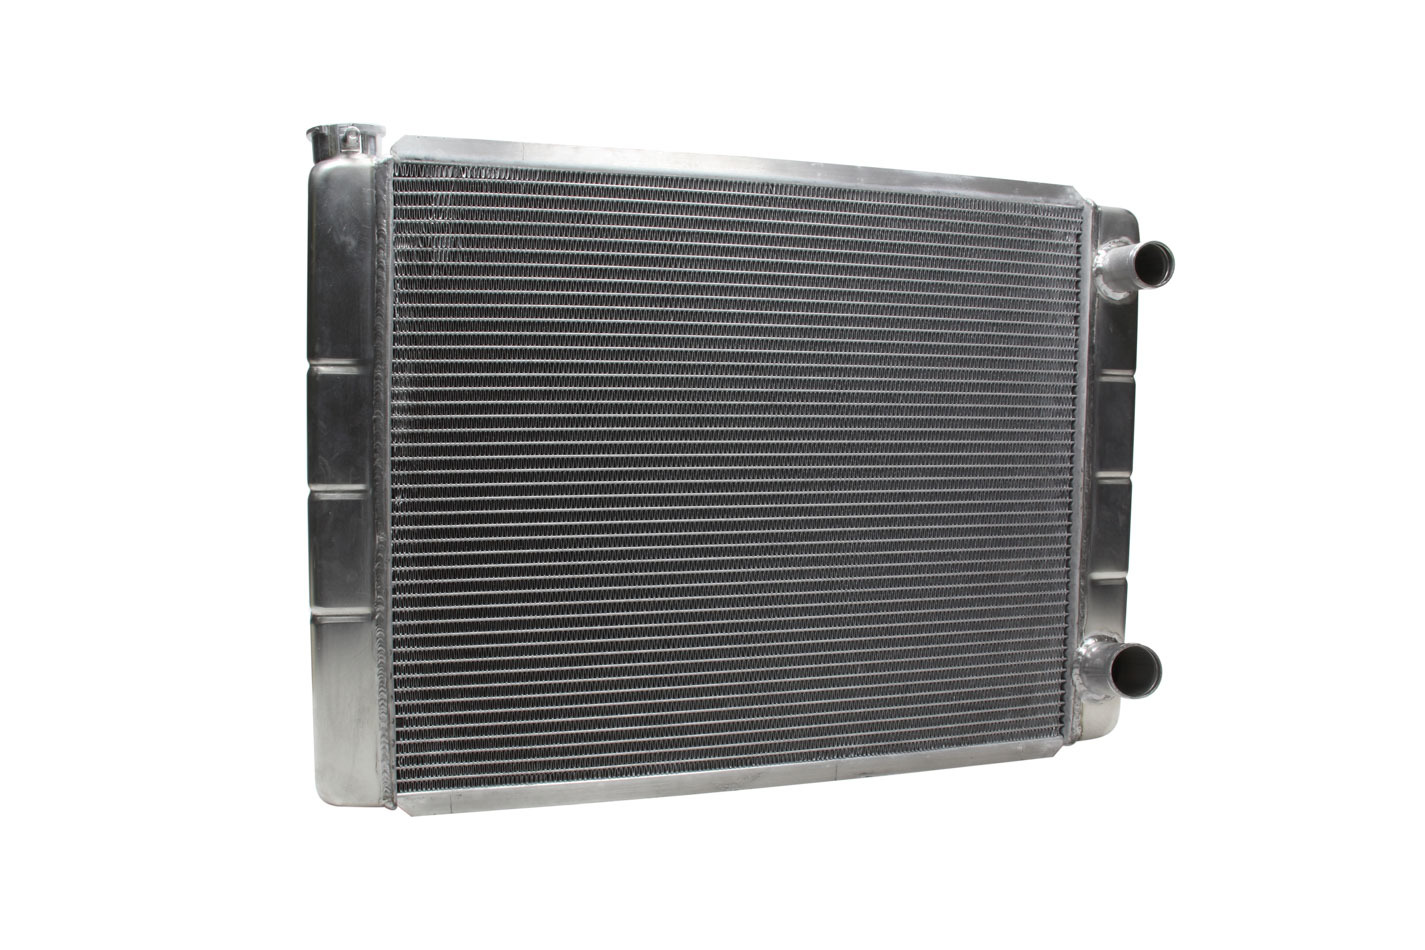 Northern Radiator 209624 Radiator, 28 W x 19 H x 3 1/8 D, Dual Pass, Passenger Side Inlet, Passenger Side Outlet, Aluminum, Natural, GM, Each